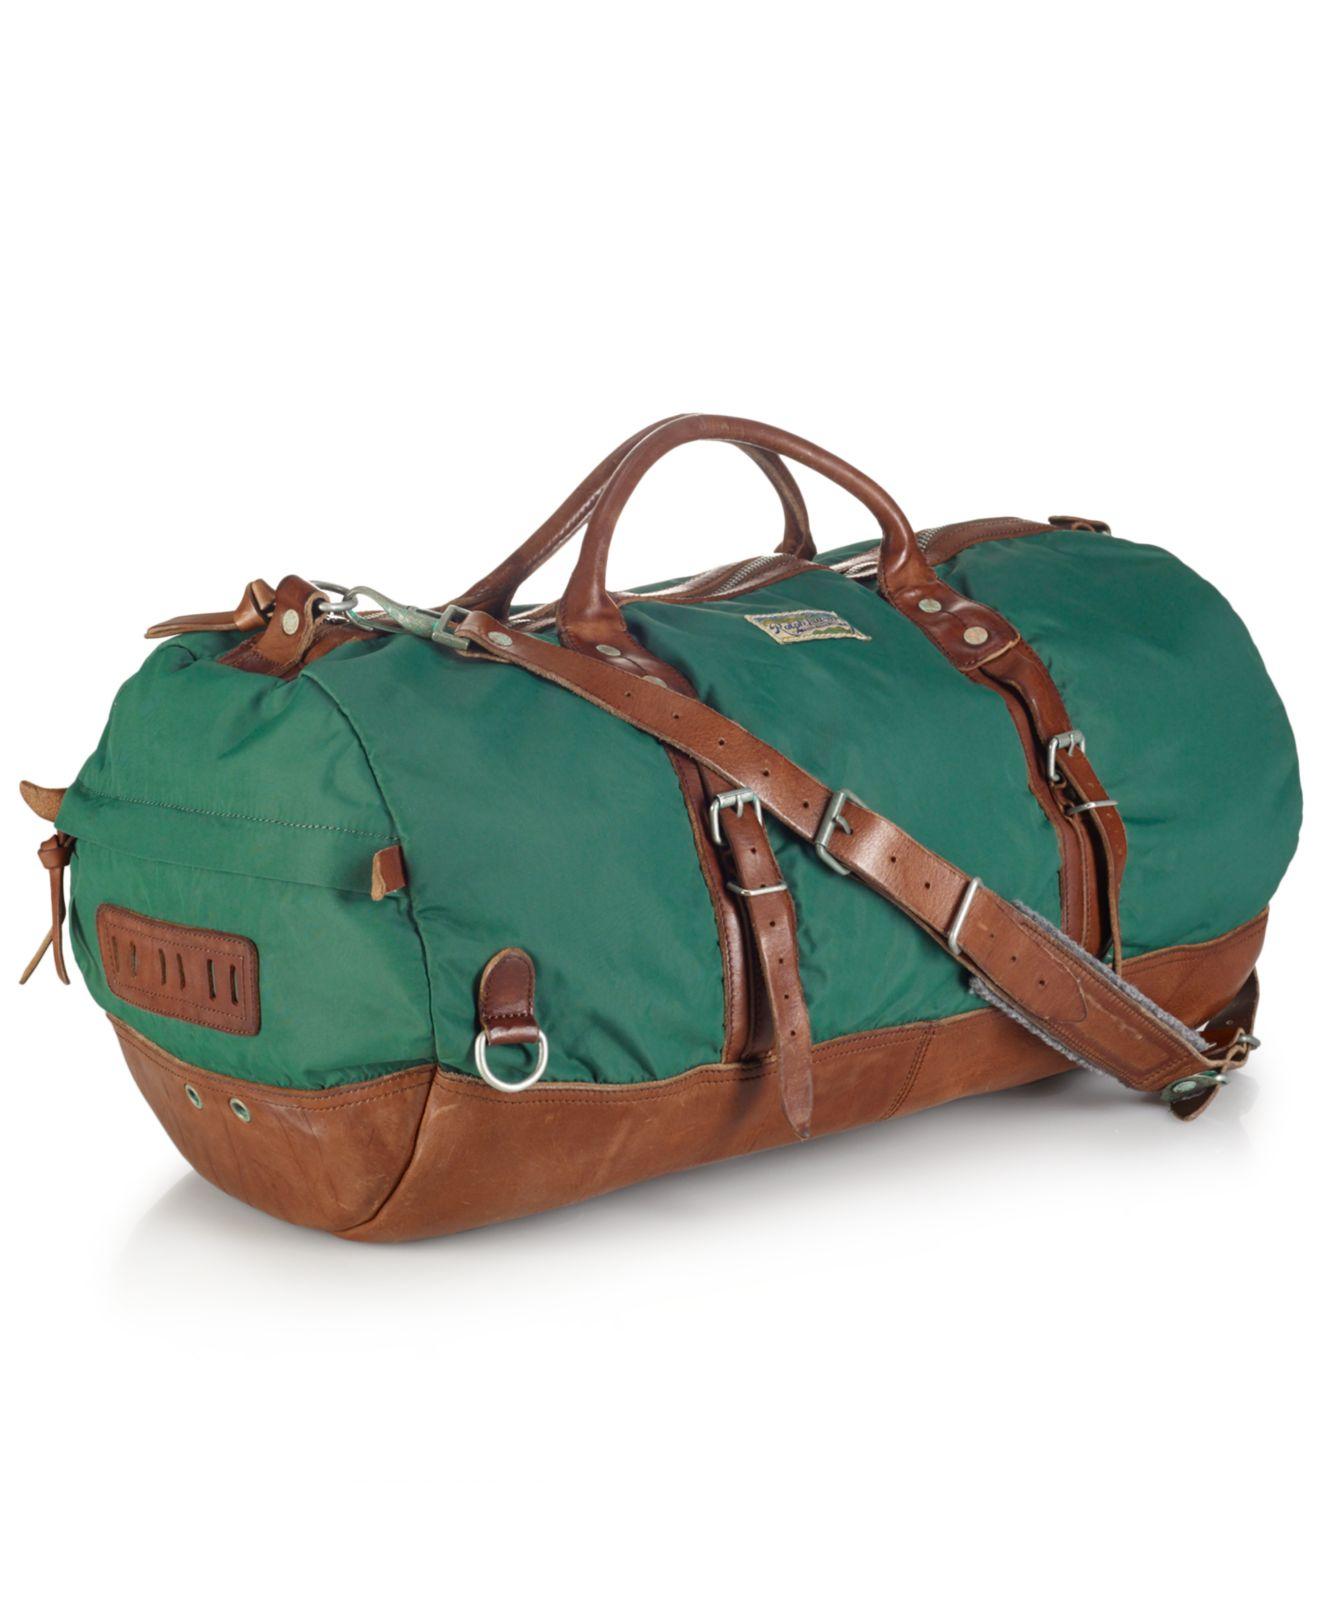 Lyst - Polo Ralph Lauren Yosemite Nylon Duffle Bag in Green for Men 17e8ce8de5